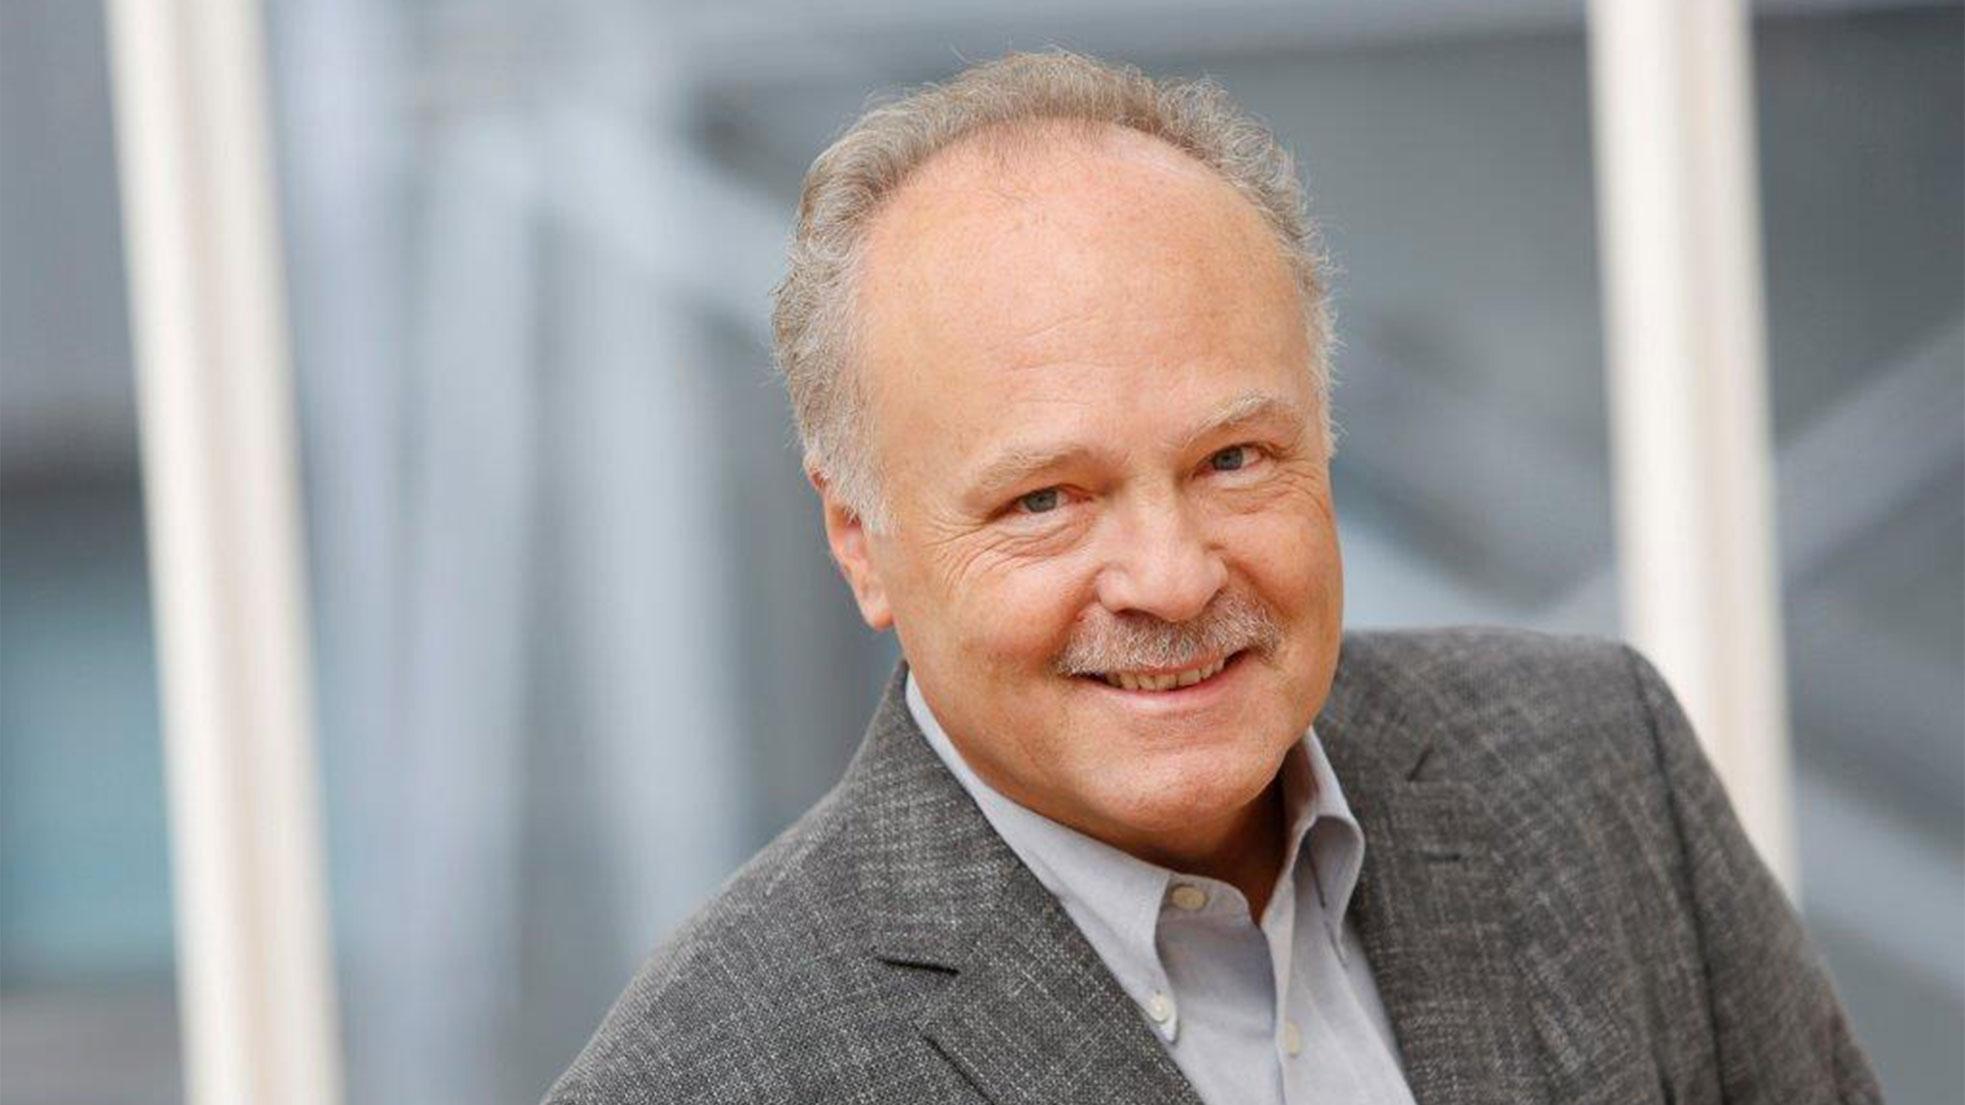 Peter Boudgoust